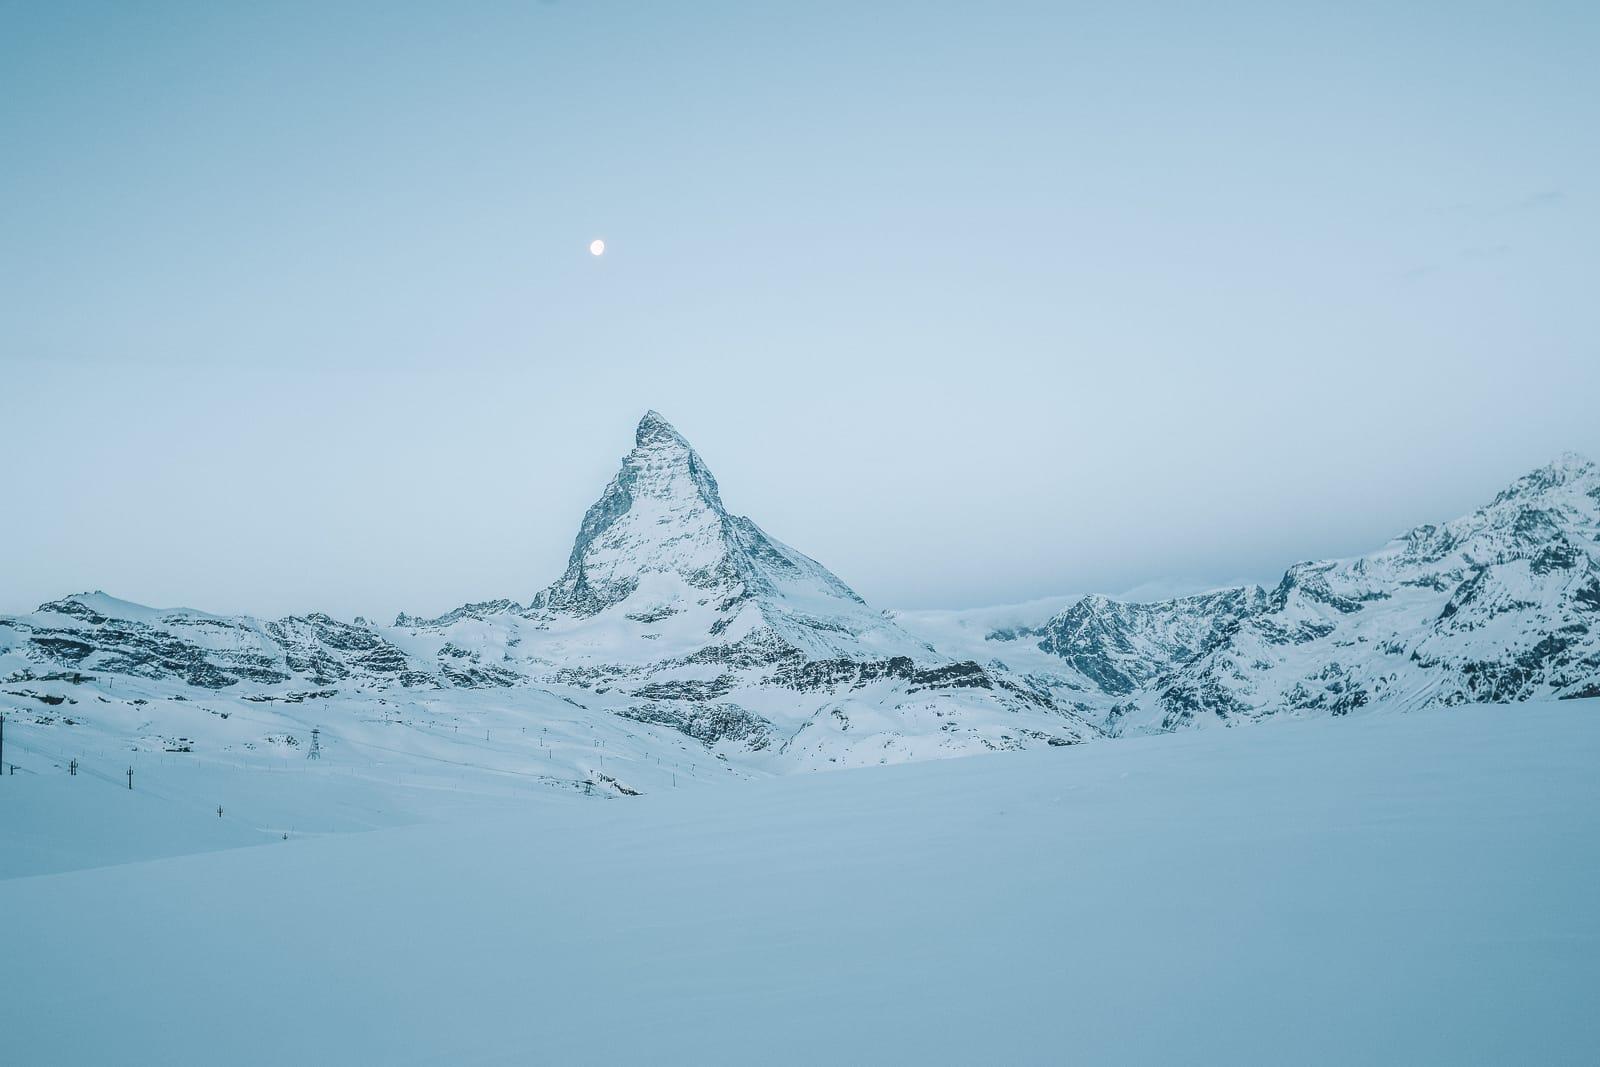 Sleeping In An Igloo Under The Matterhorn... In Zermatt, Switzerland (42)